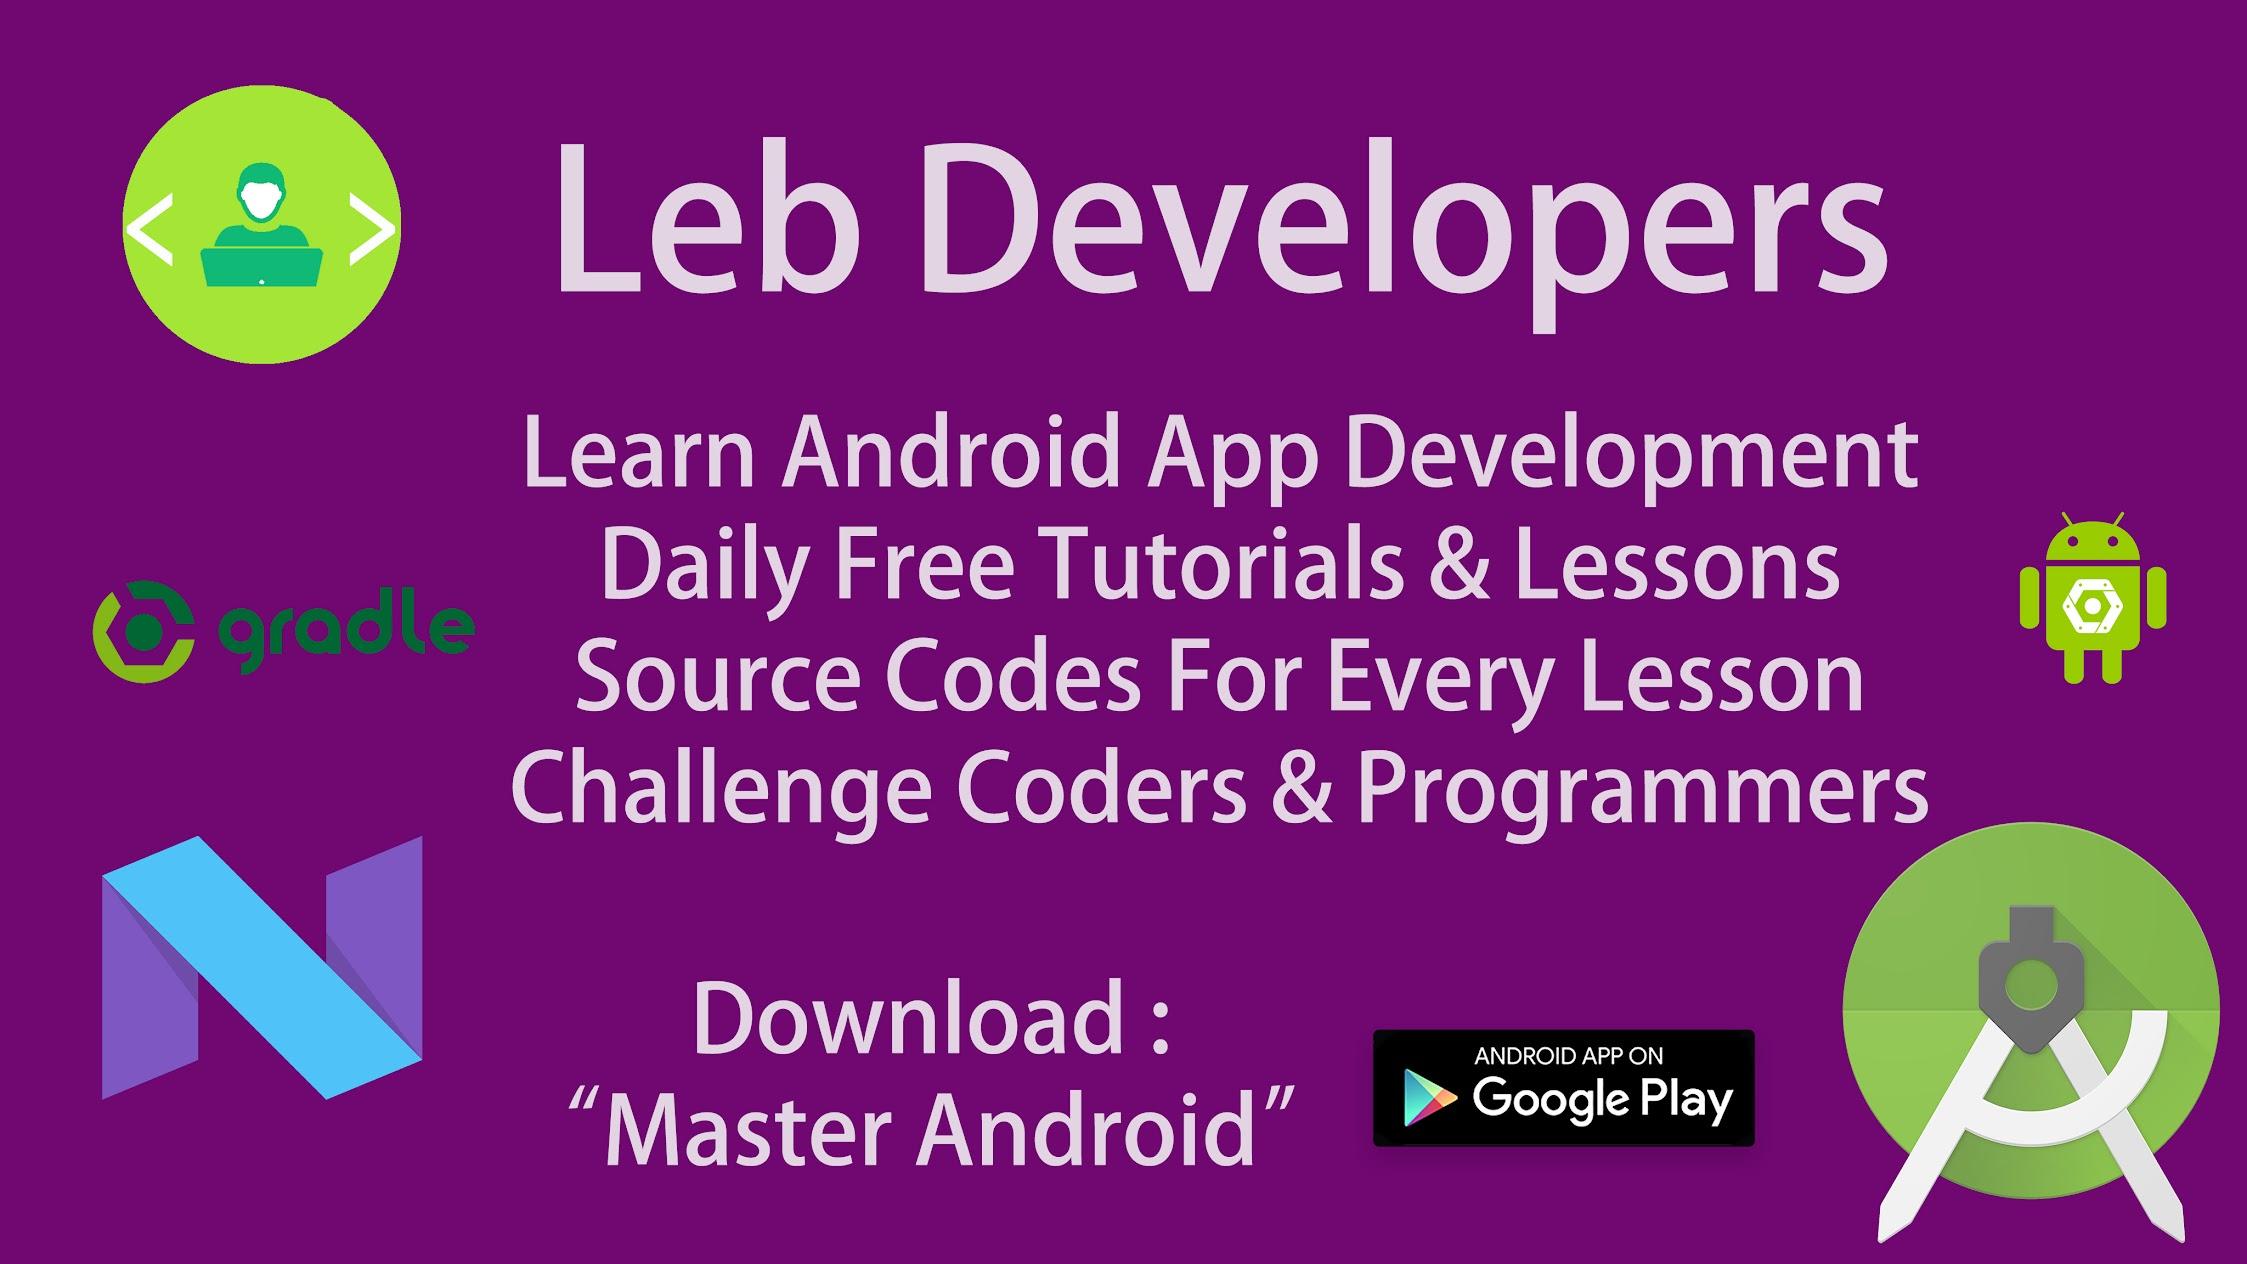 Leb Developers